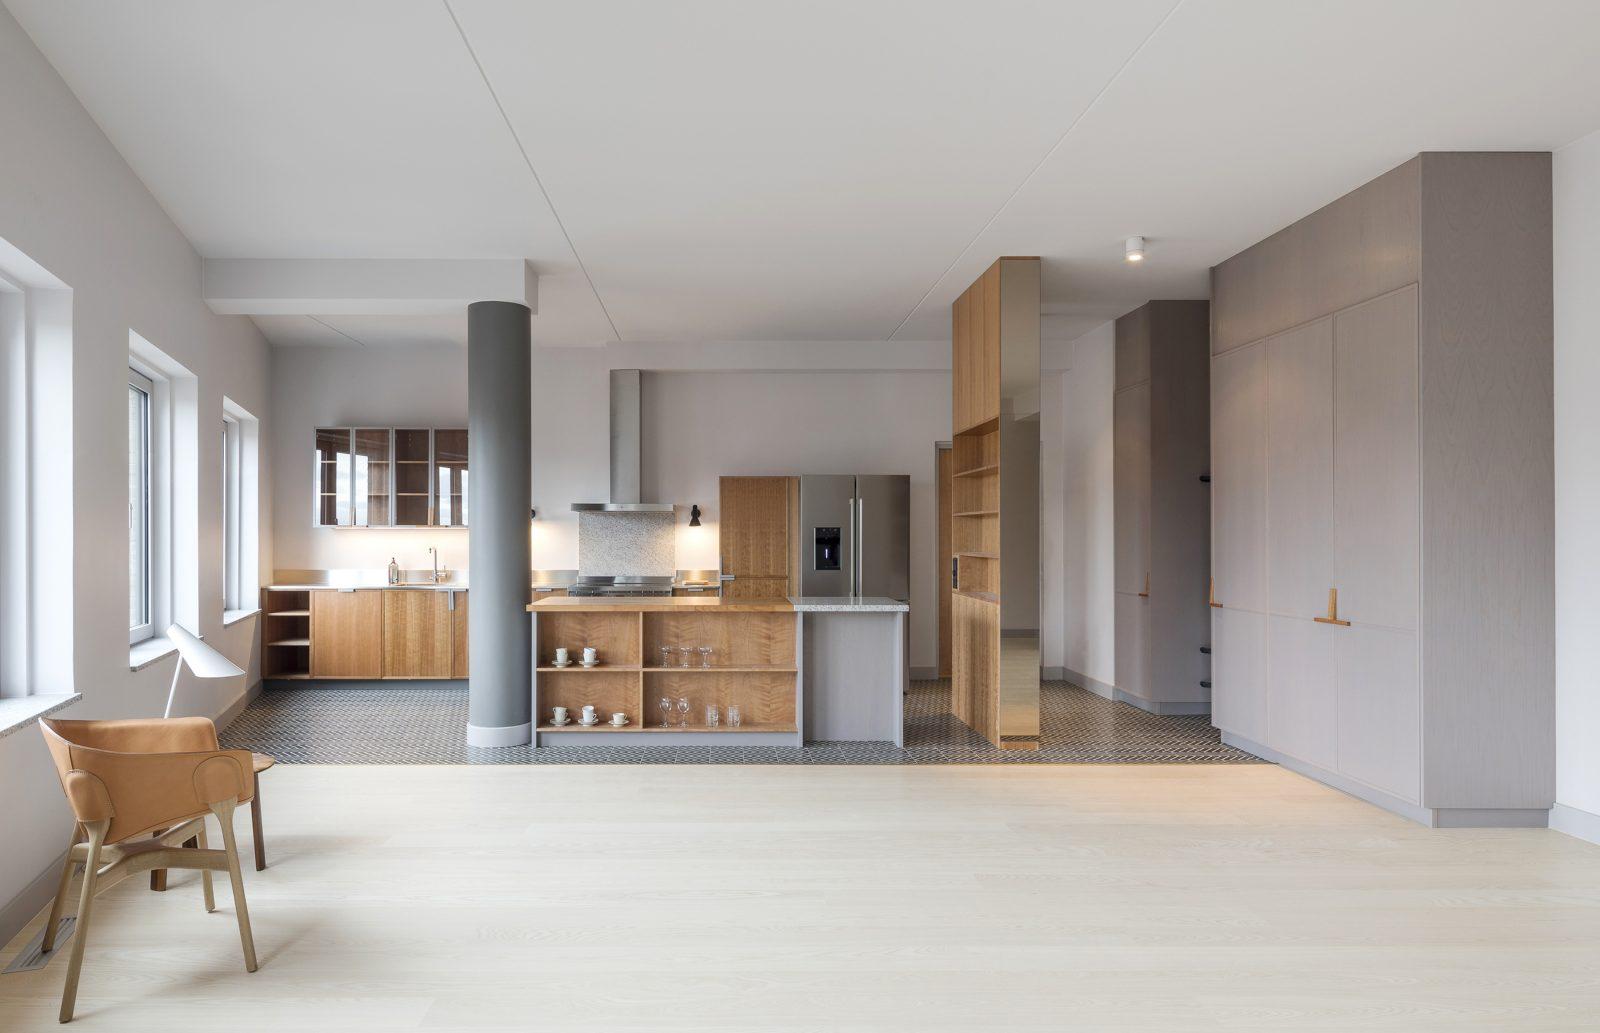 KjellanderSjoberg Etaget AdamMork Interior-02 3600x2324